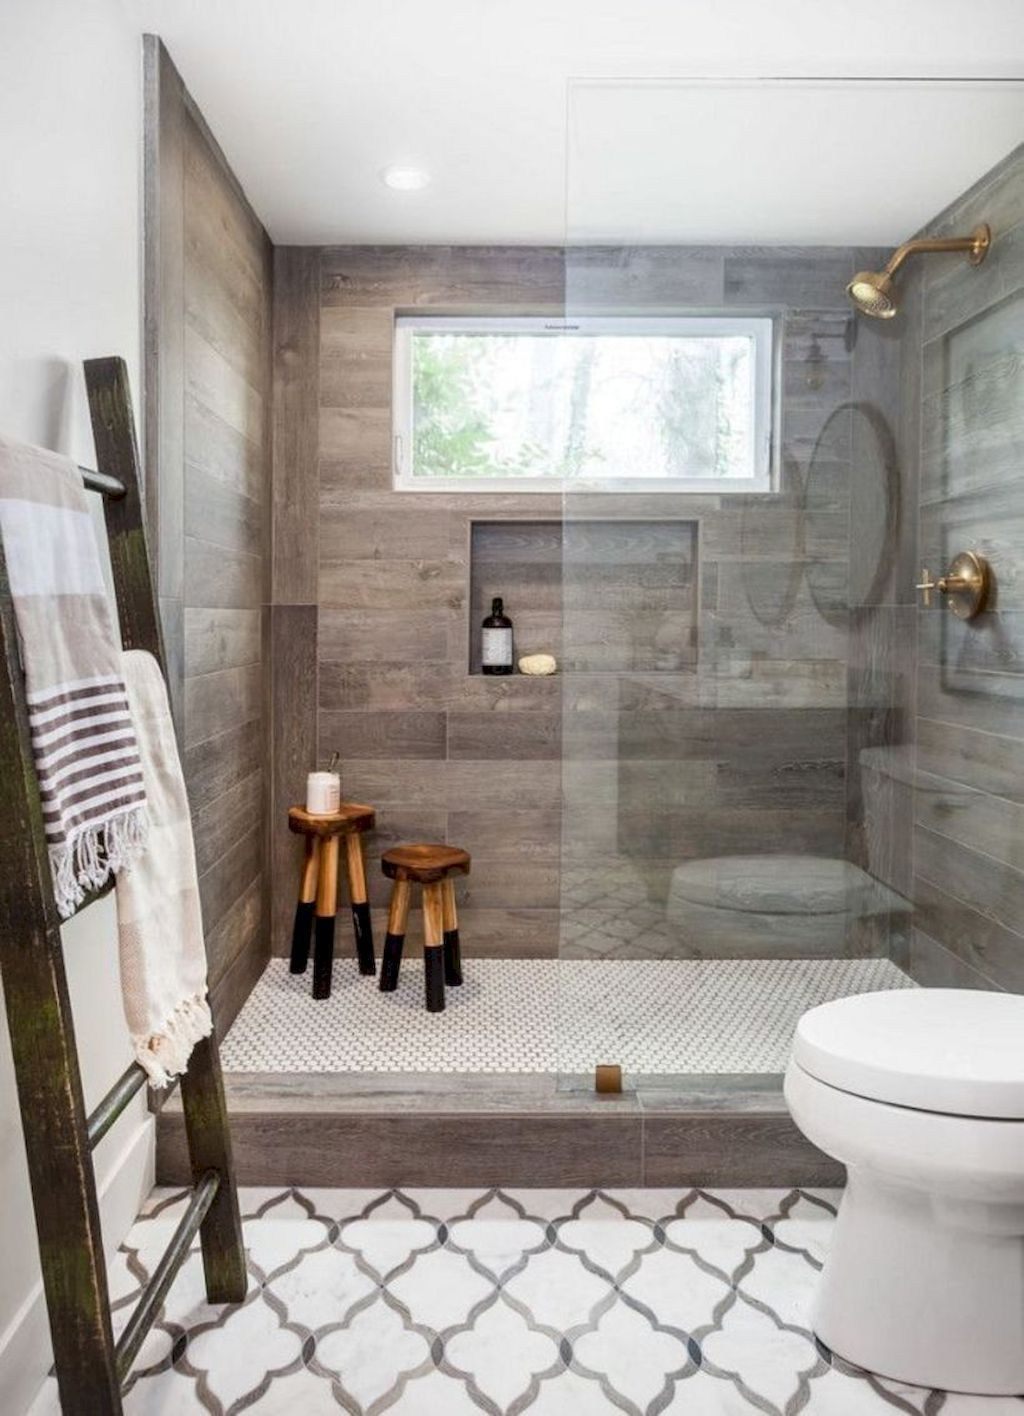 Best Small Master Bathroom Remodel Ideas 35 Farmhouse Master Bathroom Bathroom Remodel Master Small Bathroom Remodel